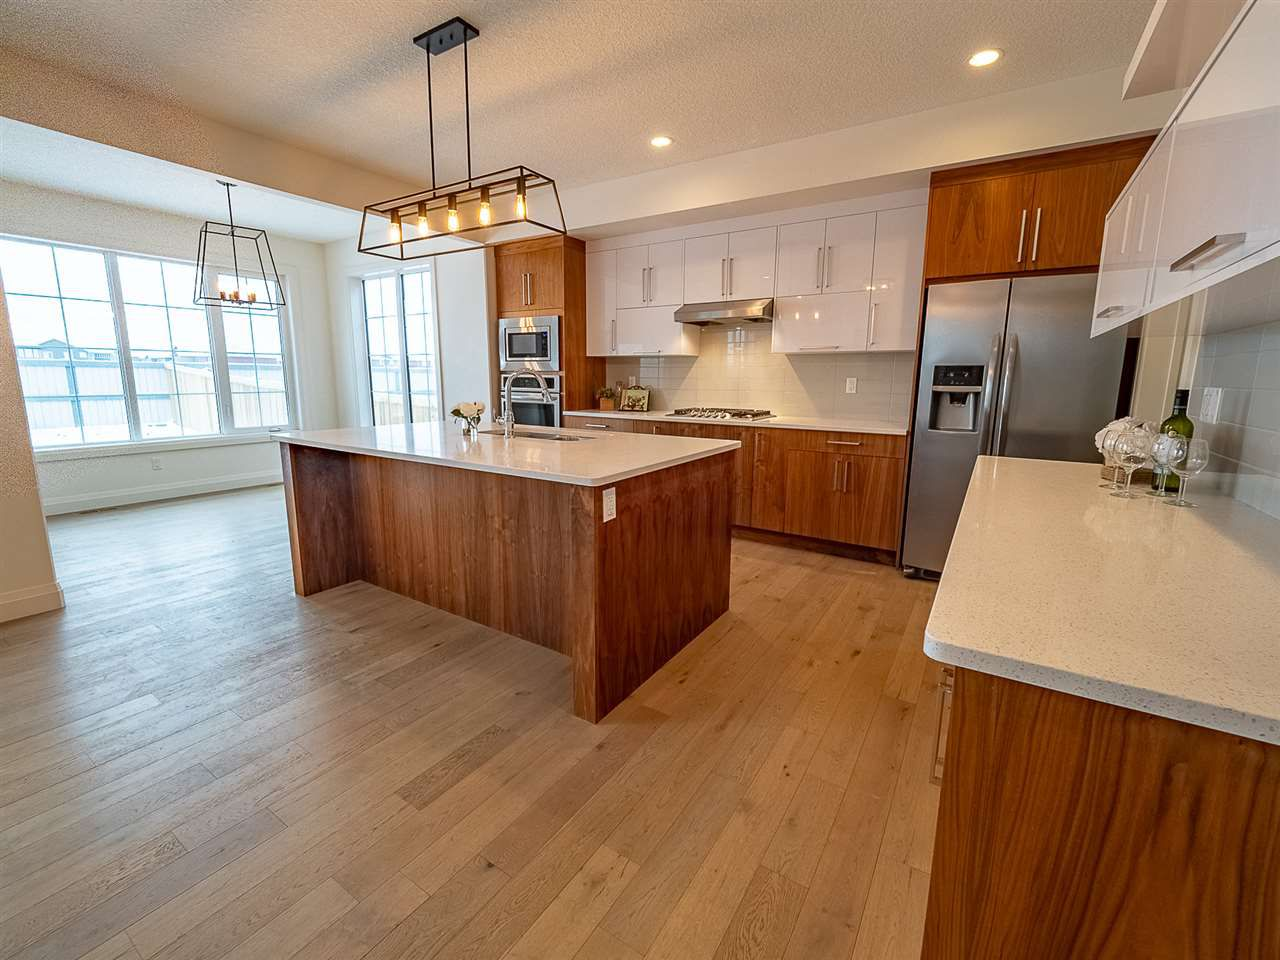 Main Photo: 8845 24 Avenue in Edmonton: Zone 53 House for sale : MLS®# E4132681